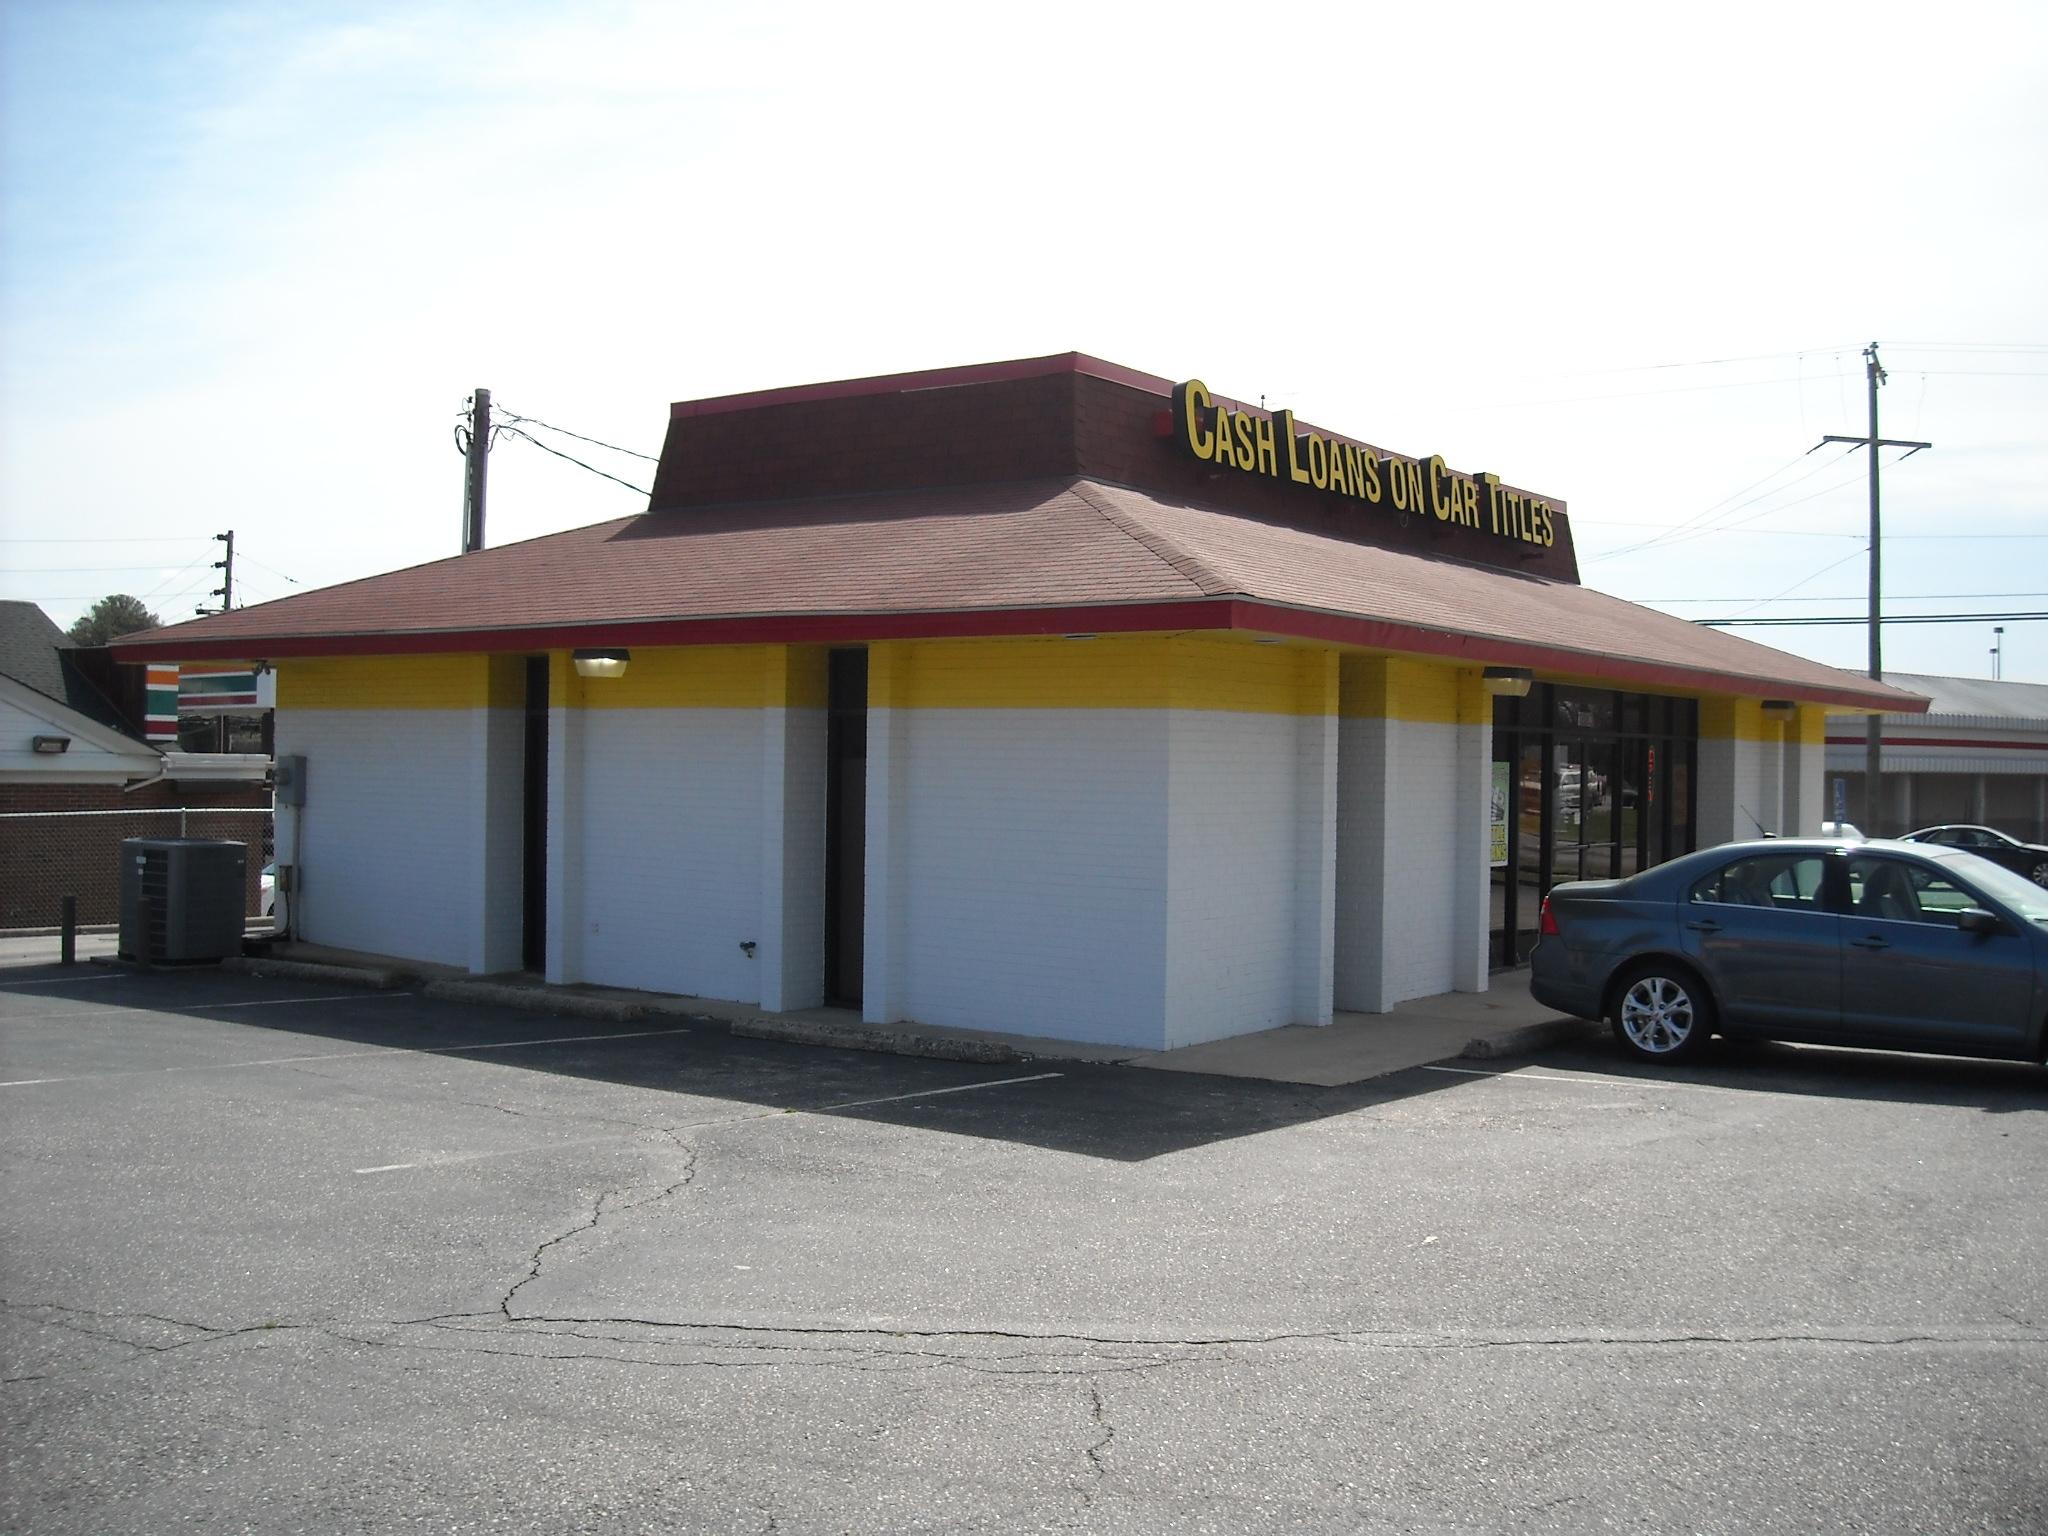 Cash loans sandusky ohio image 4